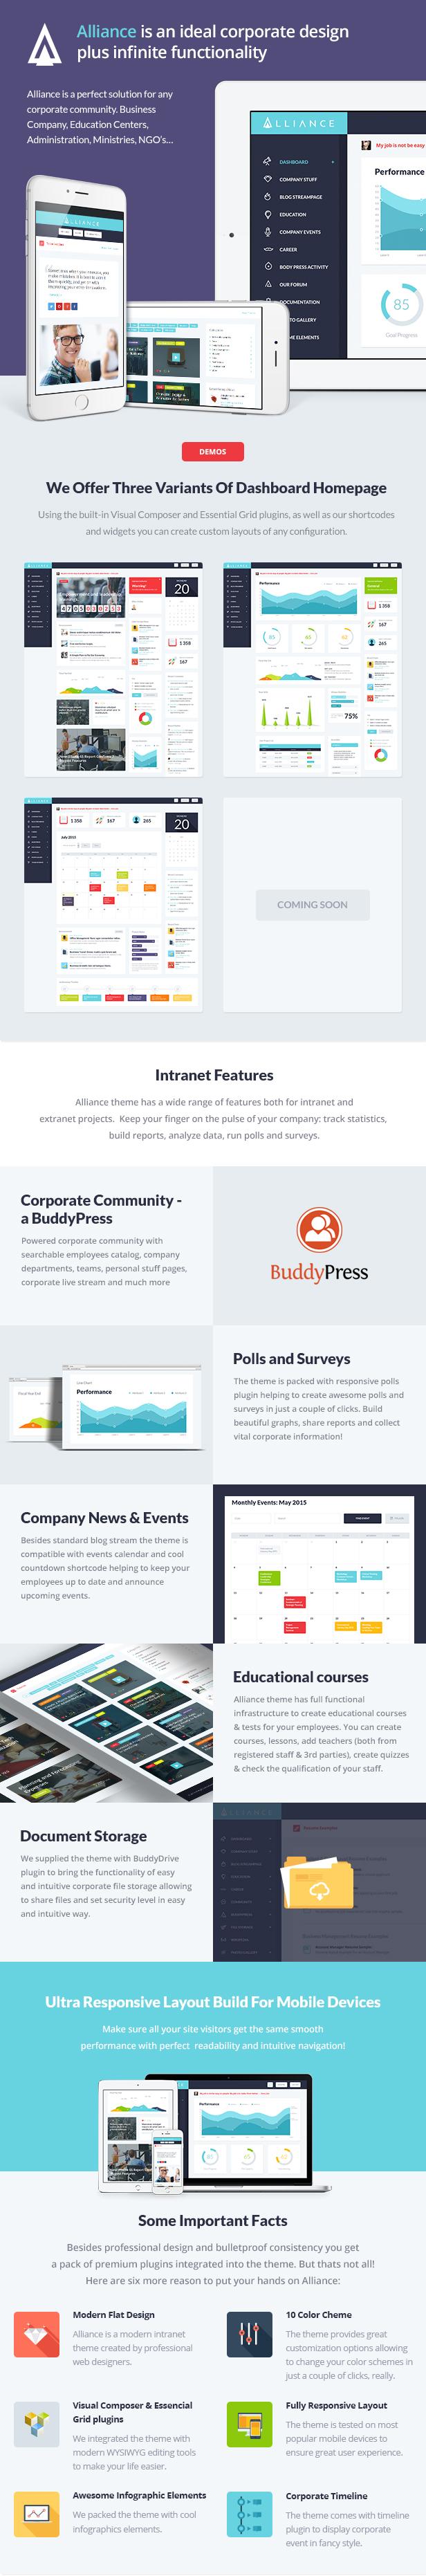 Alliance dscr new - Alliance   Intranet & Extranet WordPress Theme